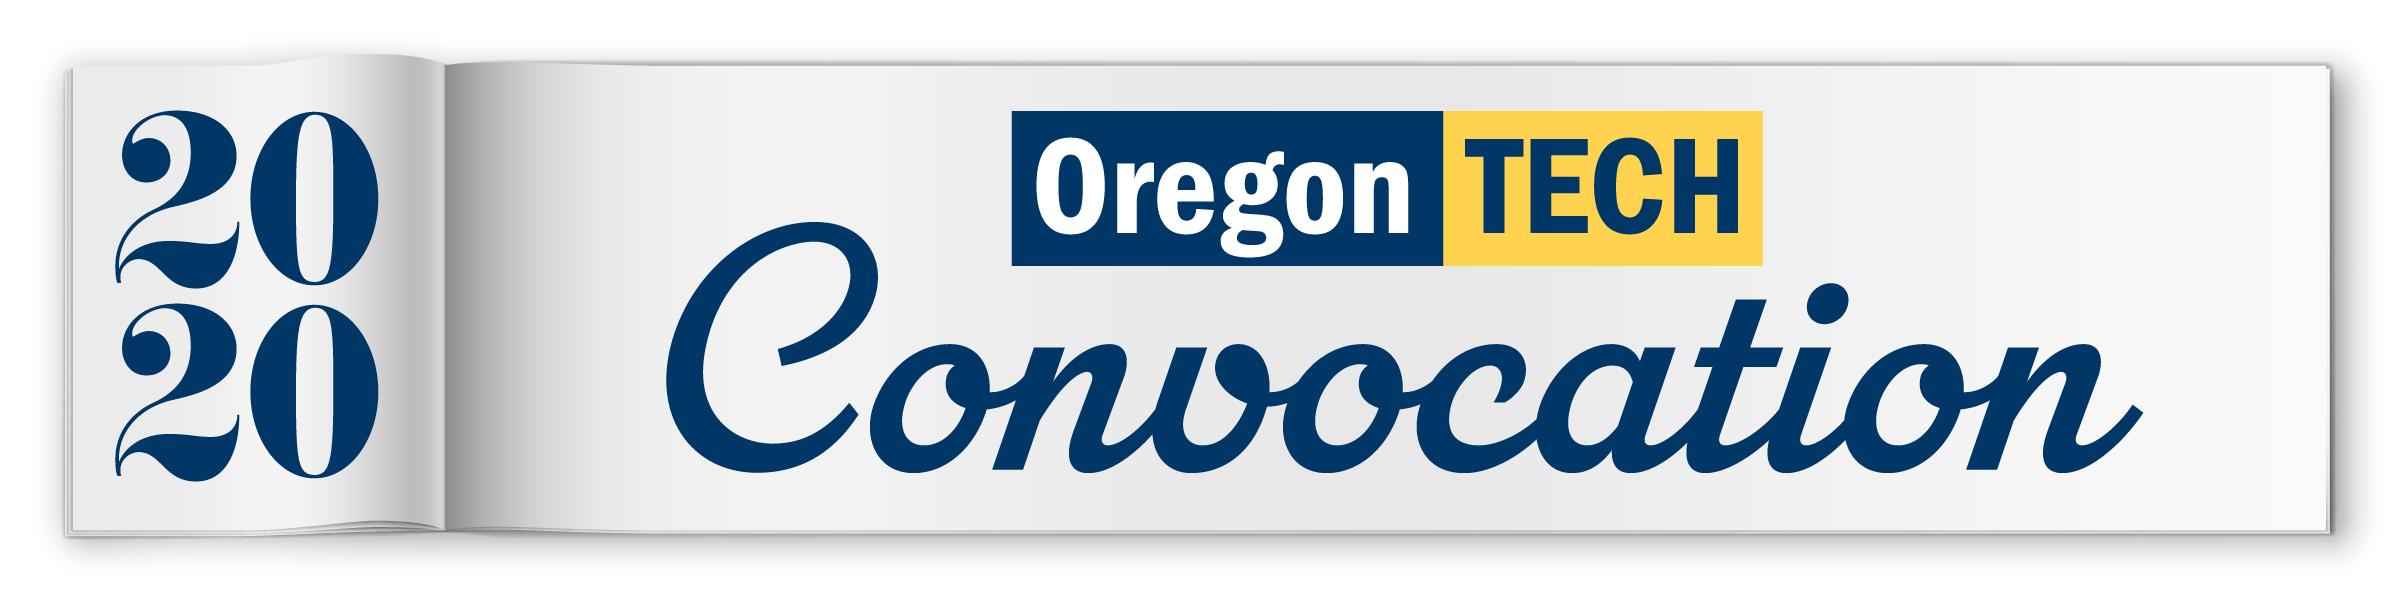 Convocation Oregon Tech 2019